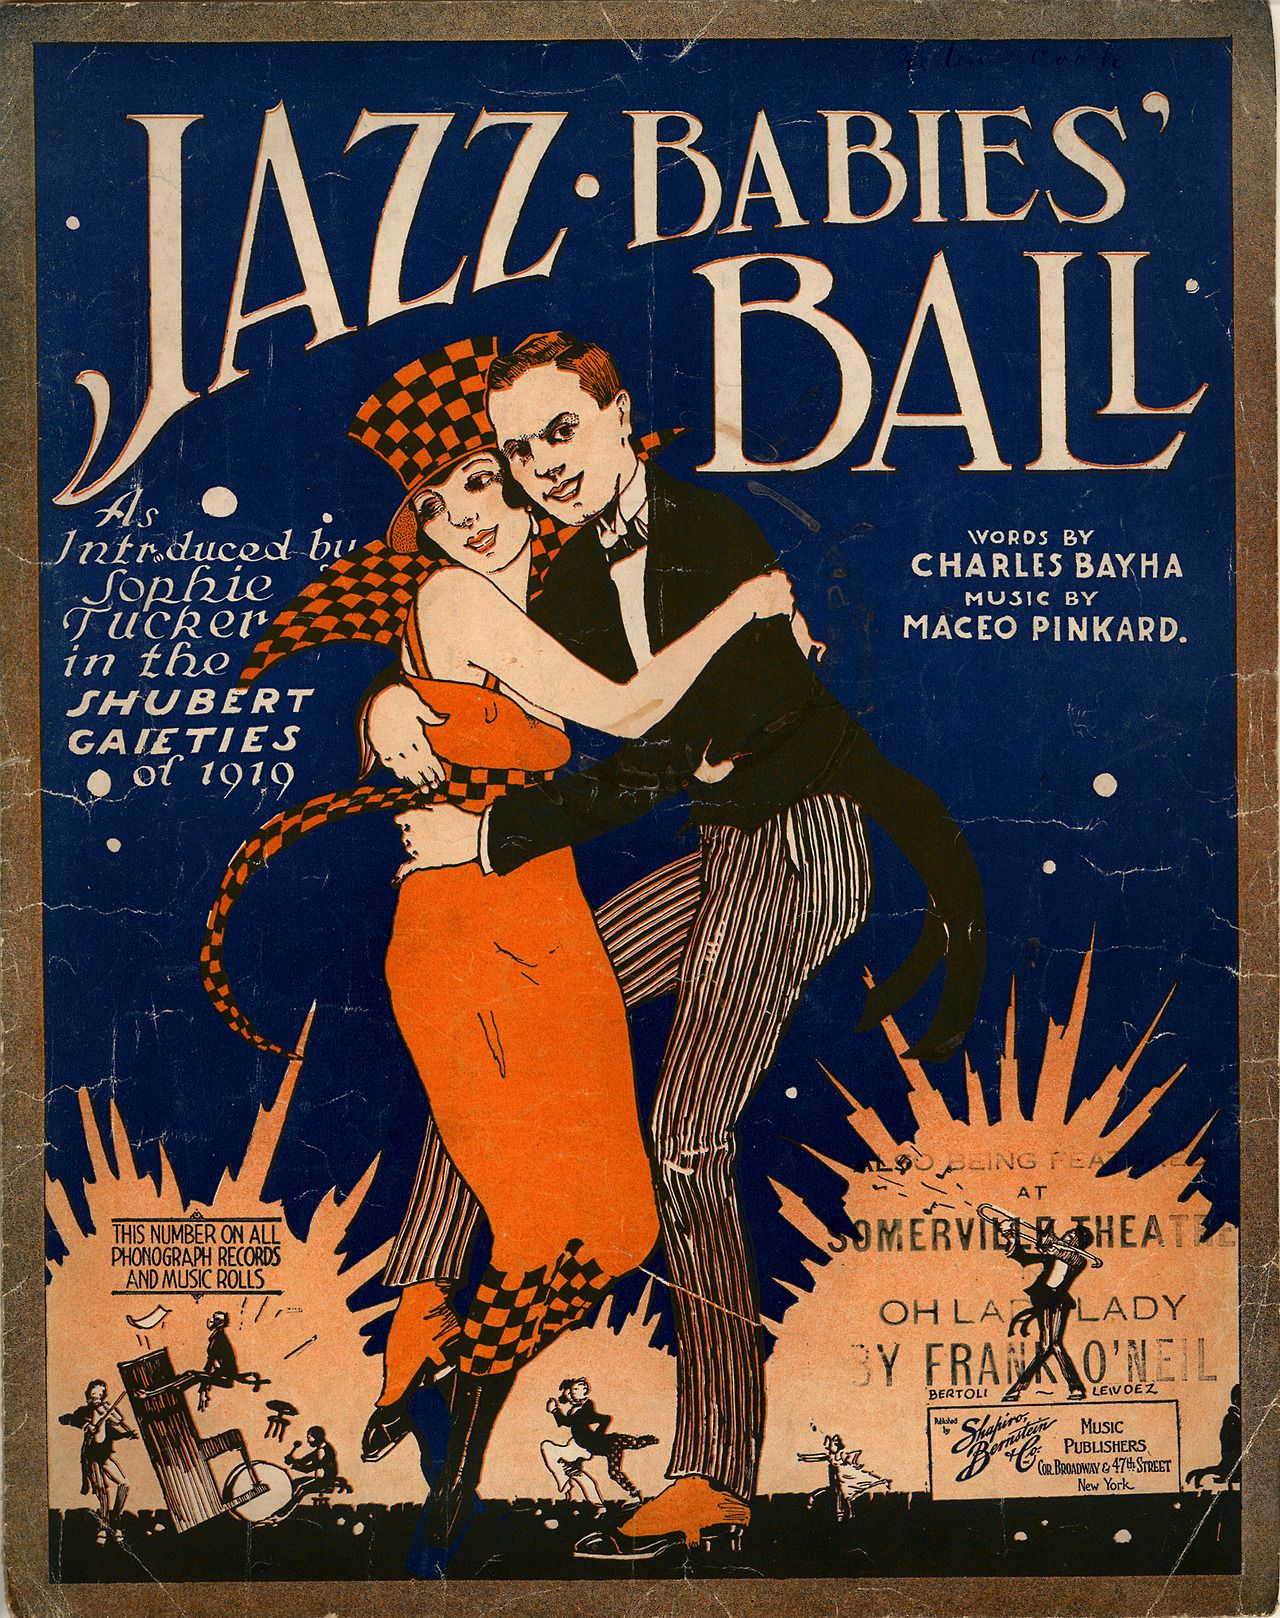 Jazz Babies Ball Historic American Sheet Music